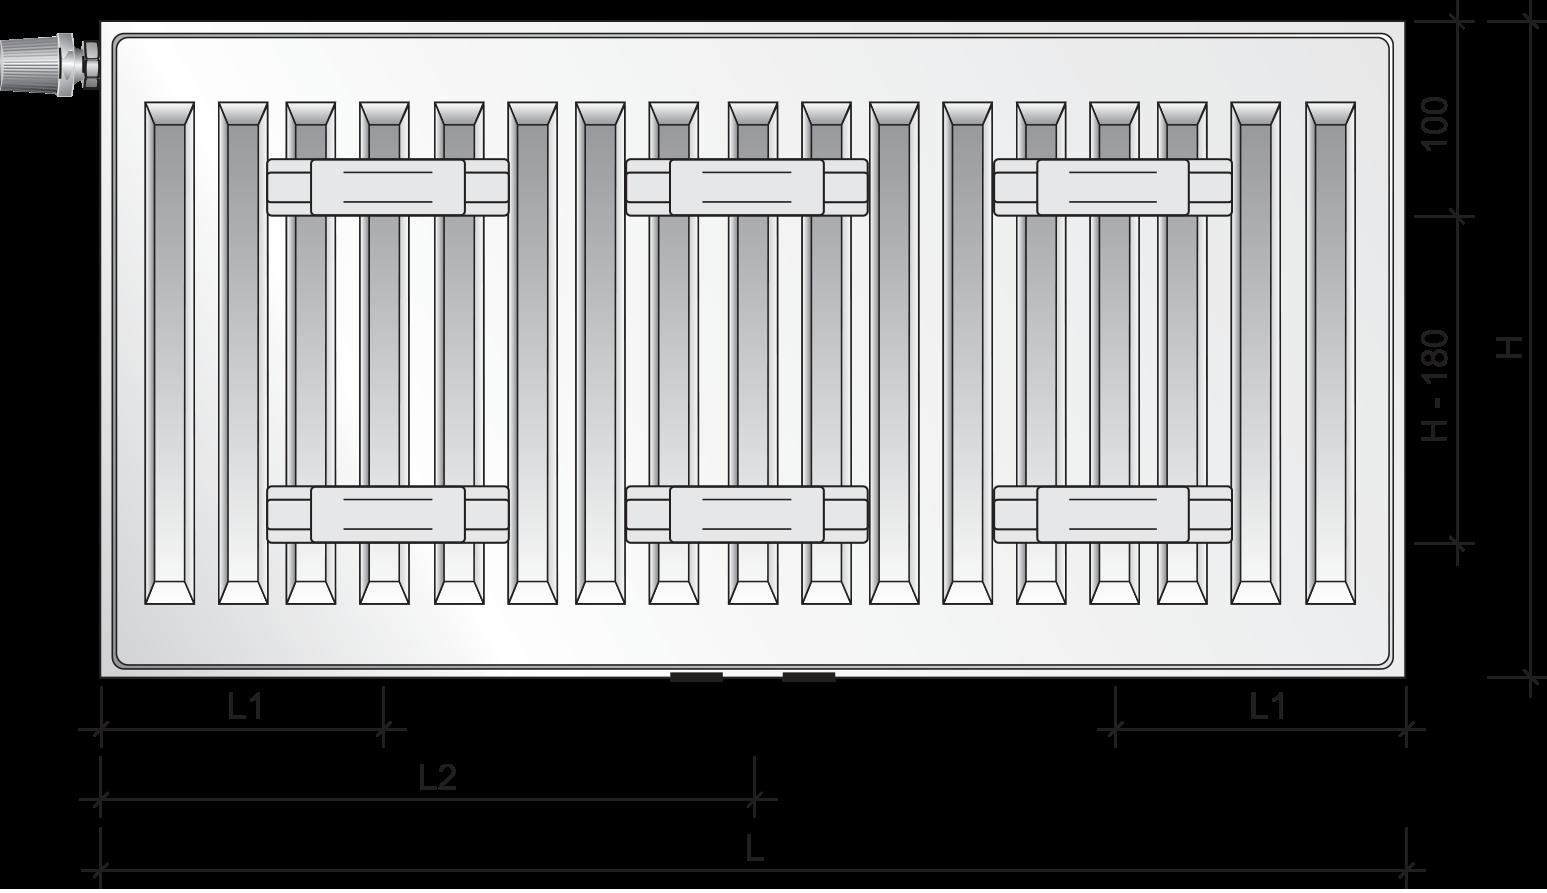 grzejnik purmo ramo ventil compact m rcvm11 300x400. Black Bedroom Furniture Sets. Home Design Ideas